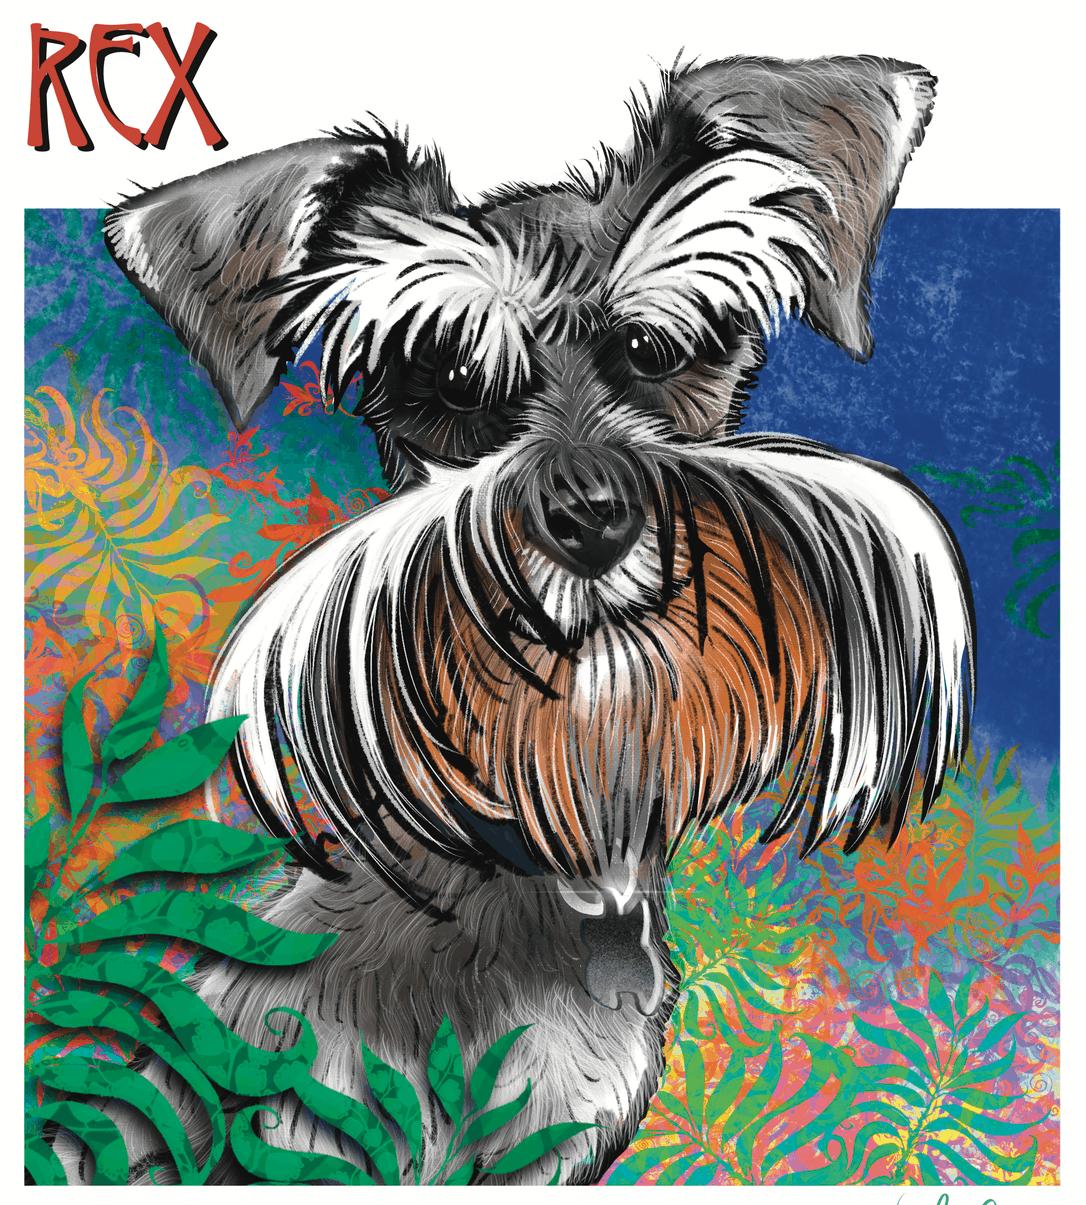 Rex The Dog Digital Caricature Blue Dolphin Website Design Peterborough